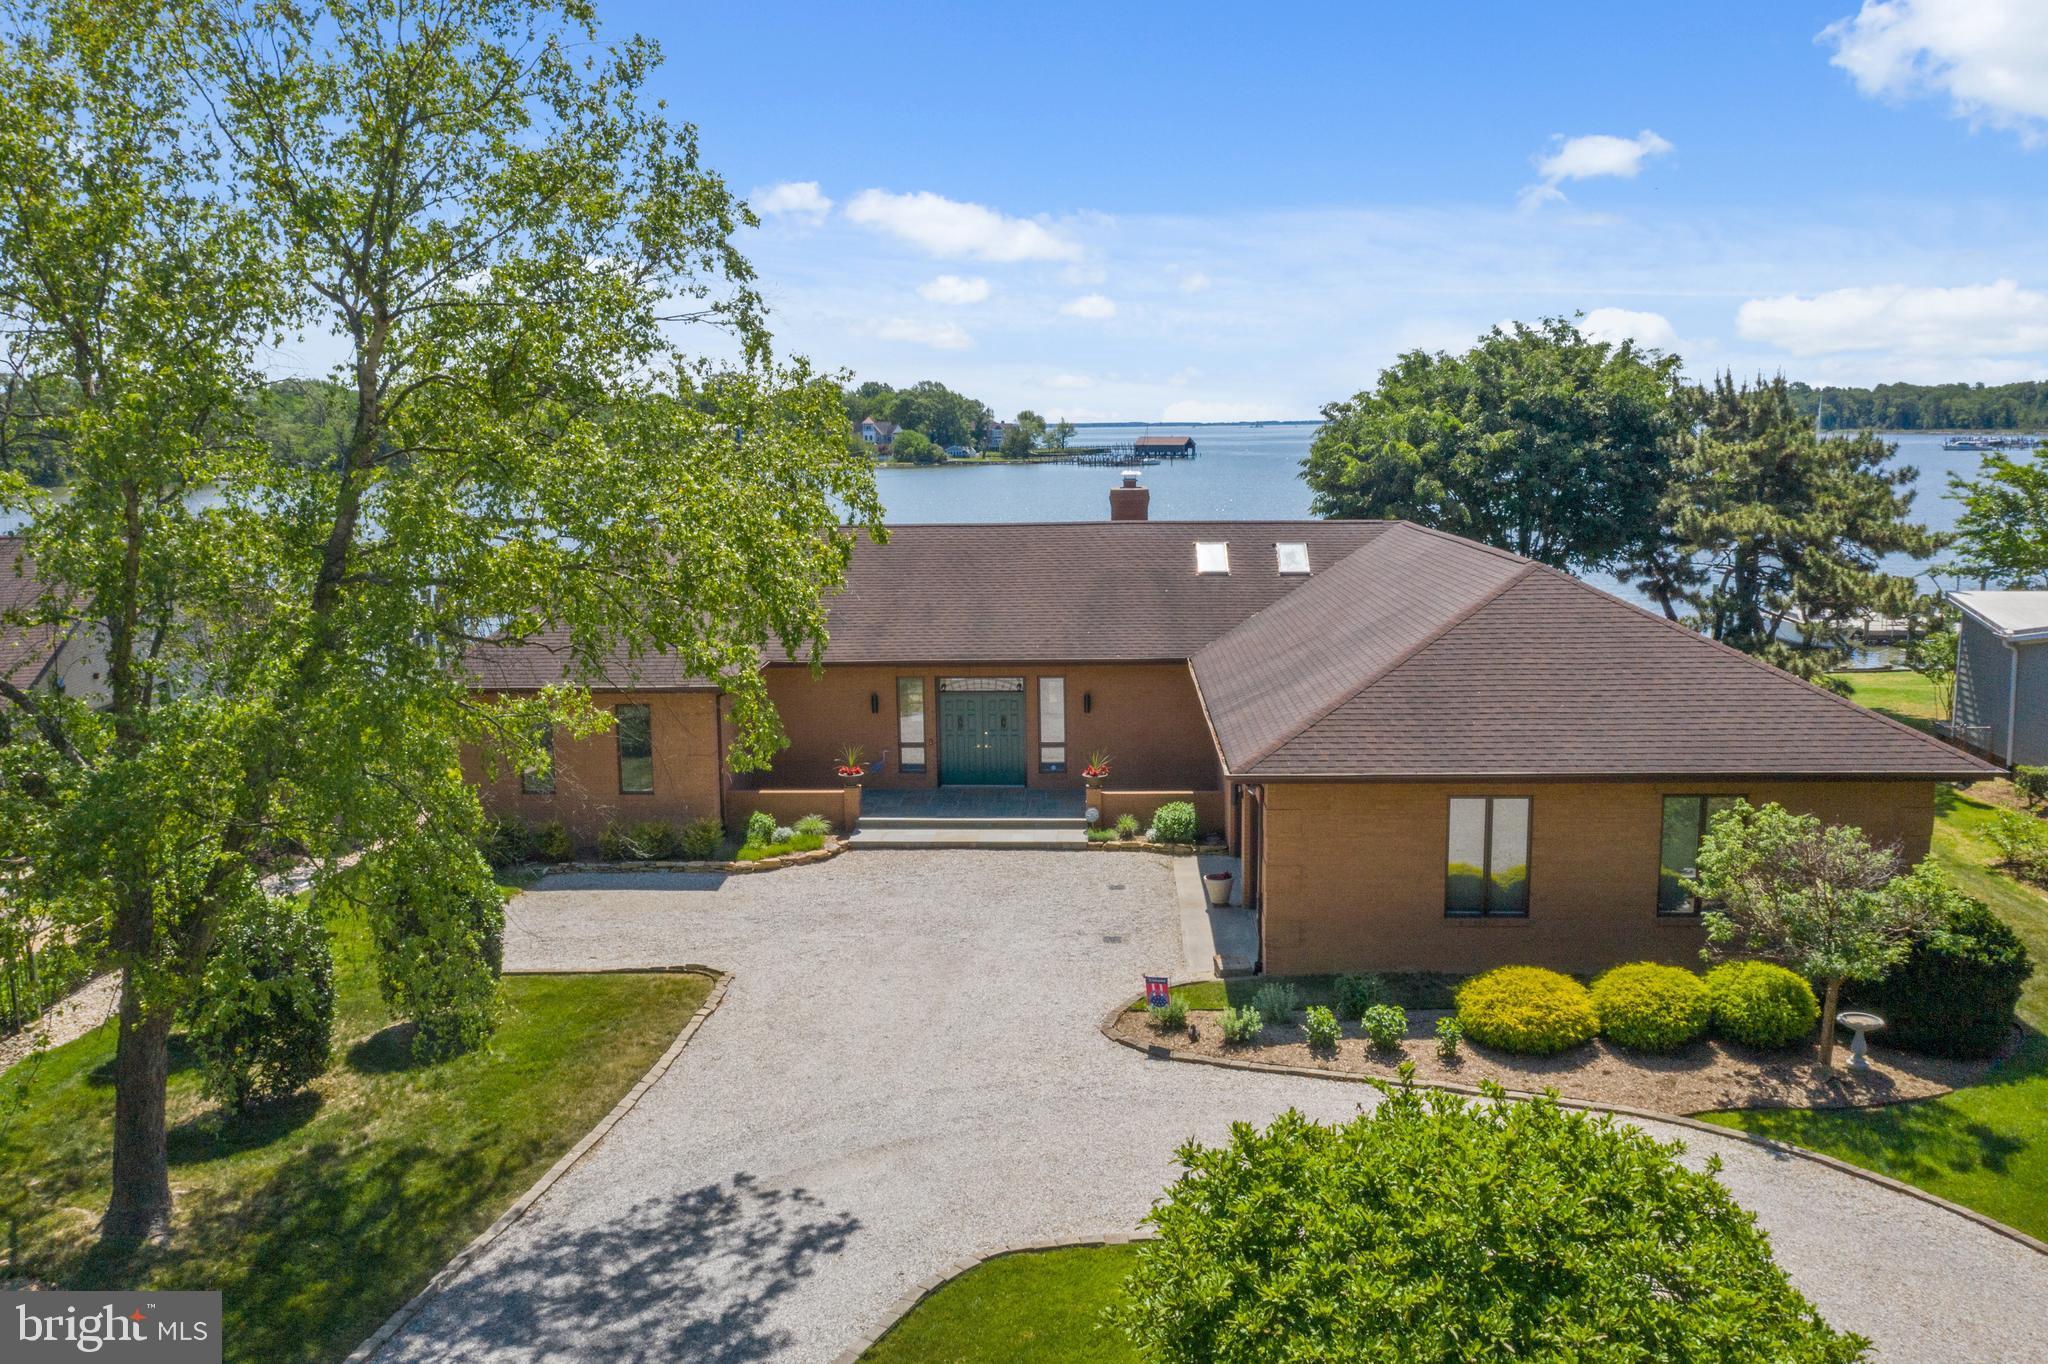 1526 Gordon Cove Dr, Annapolis, MD, 21403